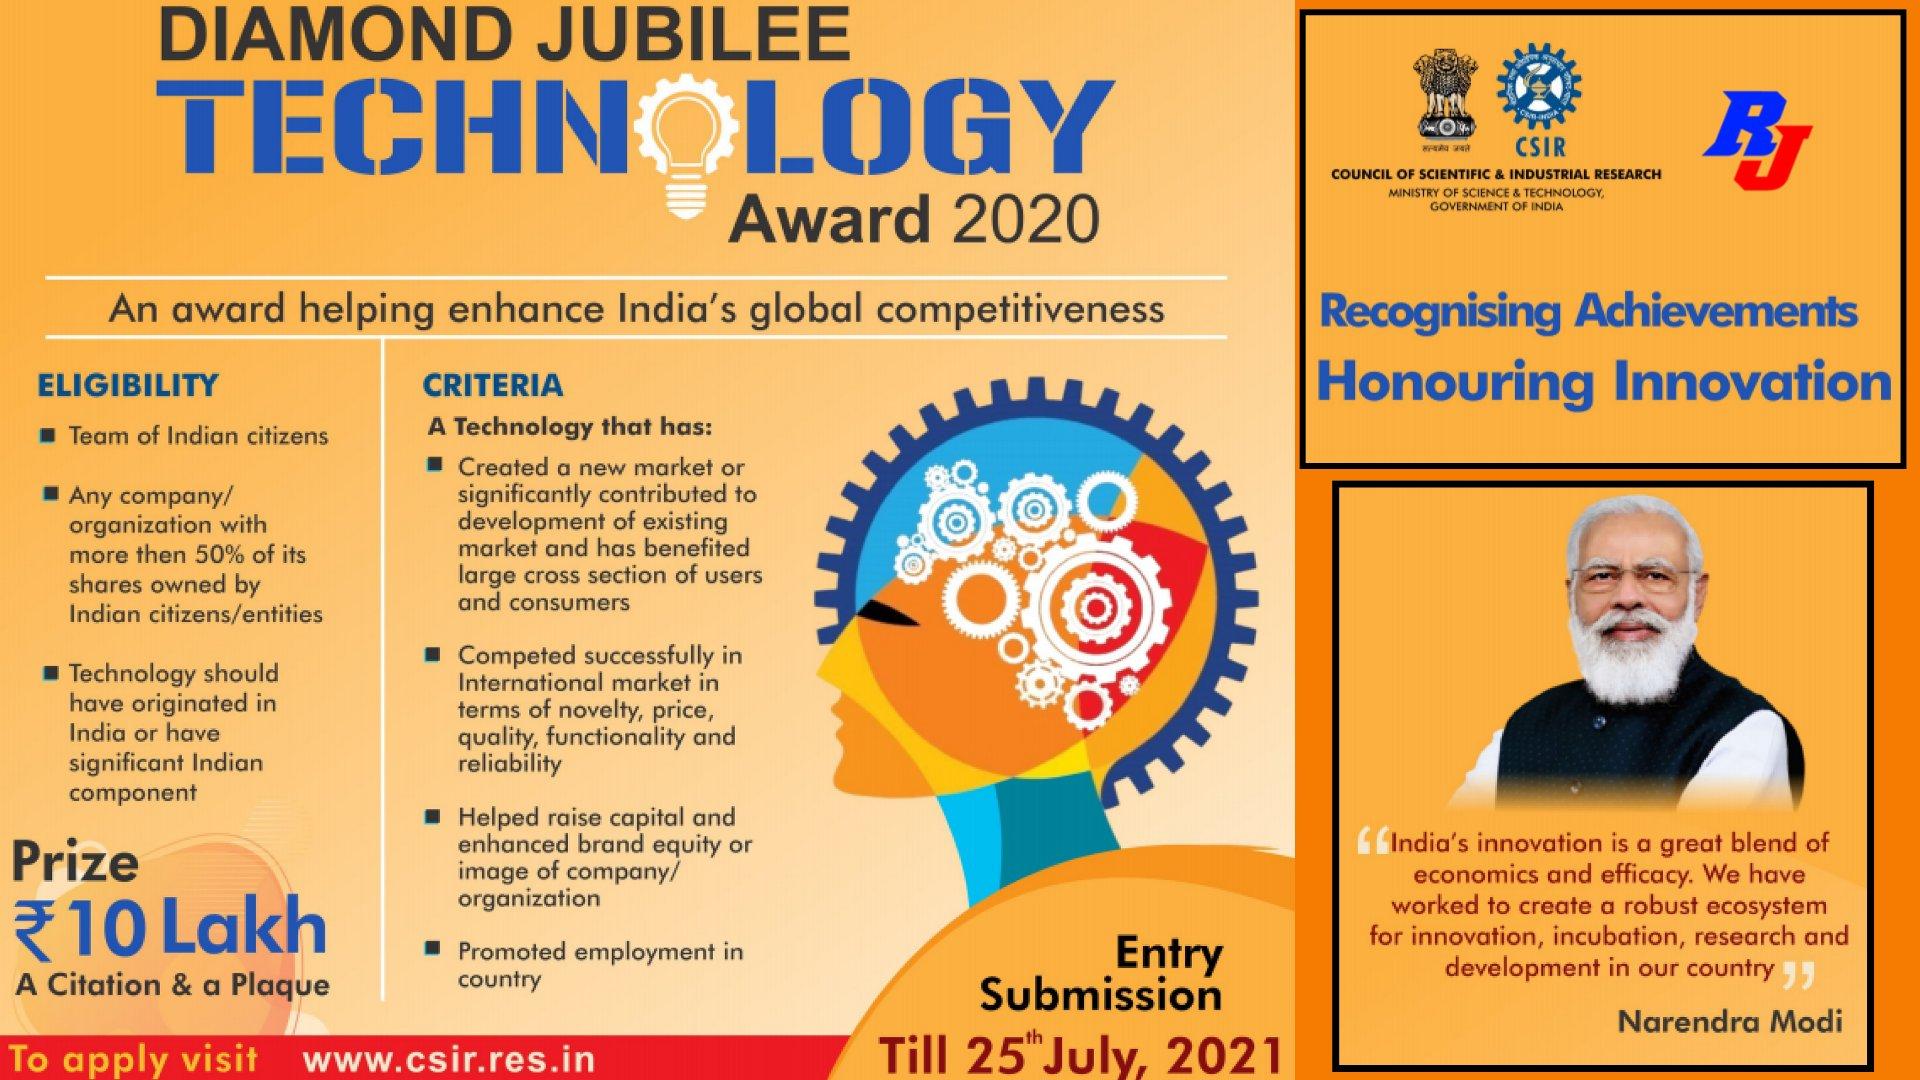 CSIR Diamond Jubilee Technology Award (CDJTA) for Technological Innovation